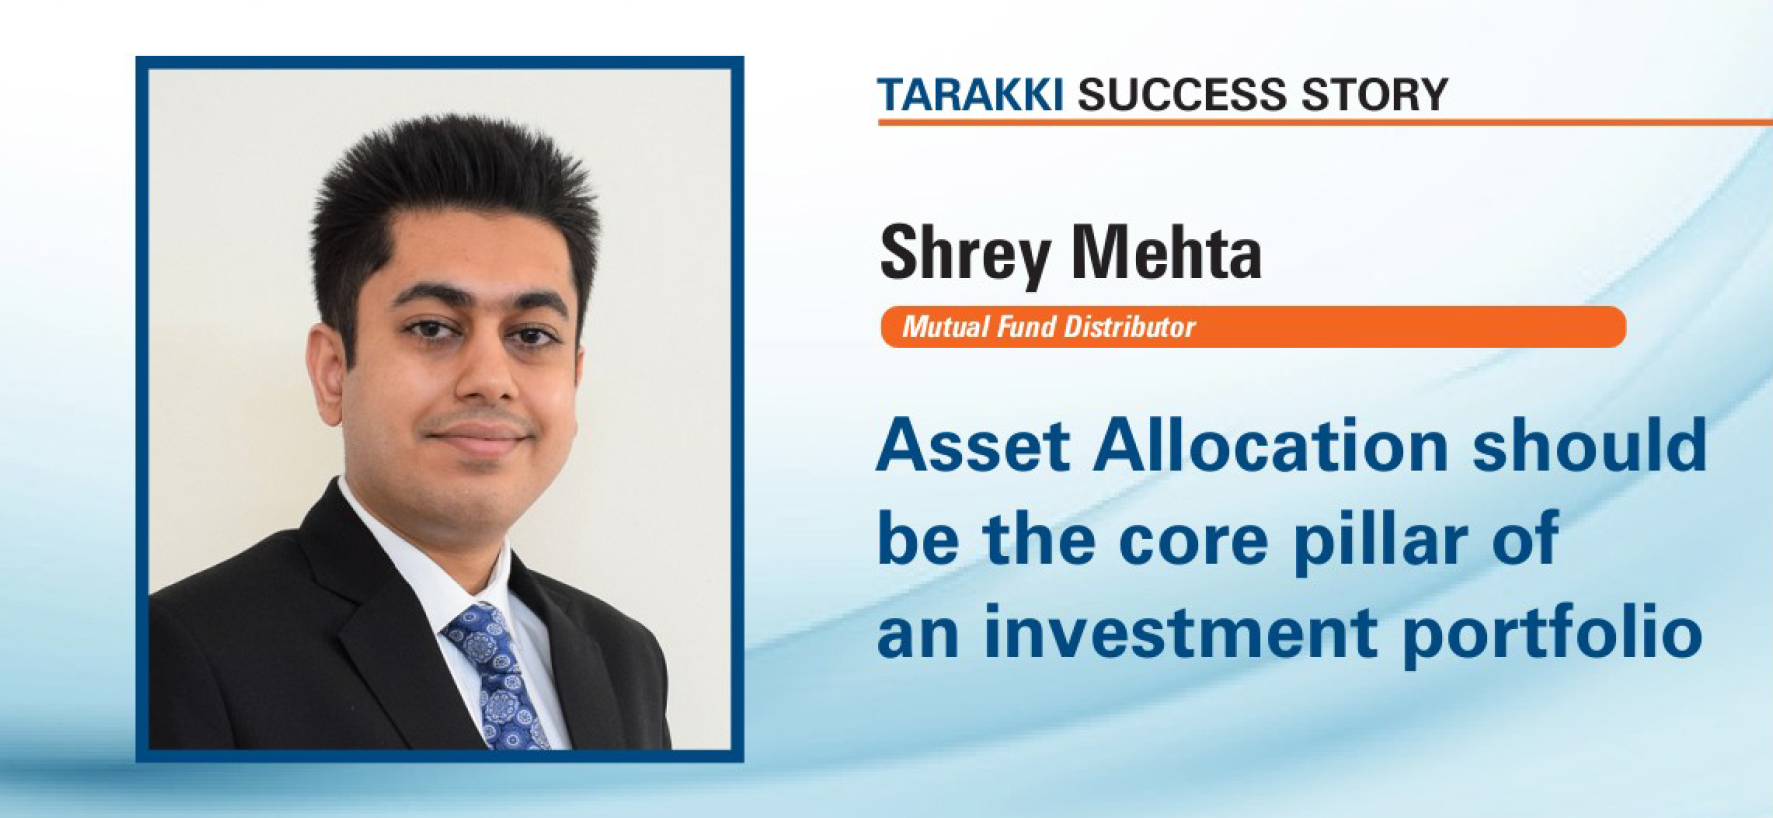 Shrey Mehta feature Image in ICICI Tarakki Times